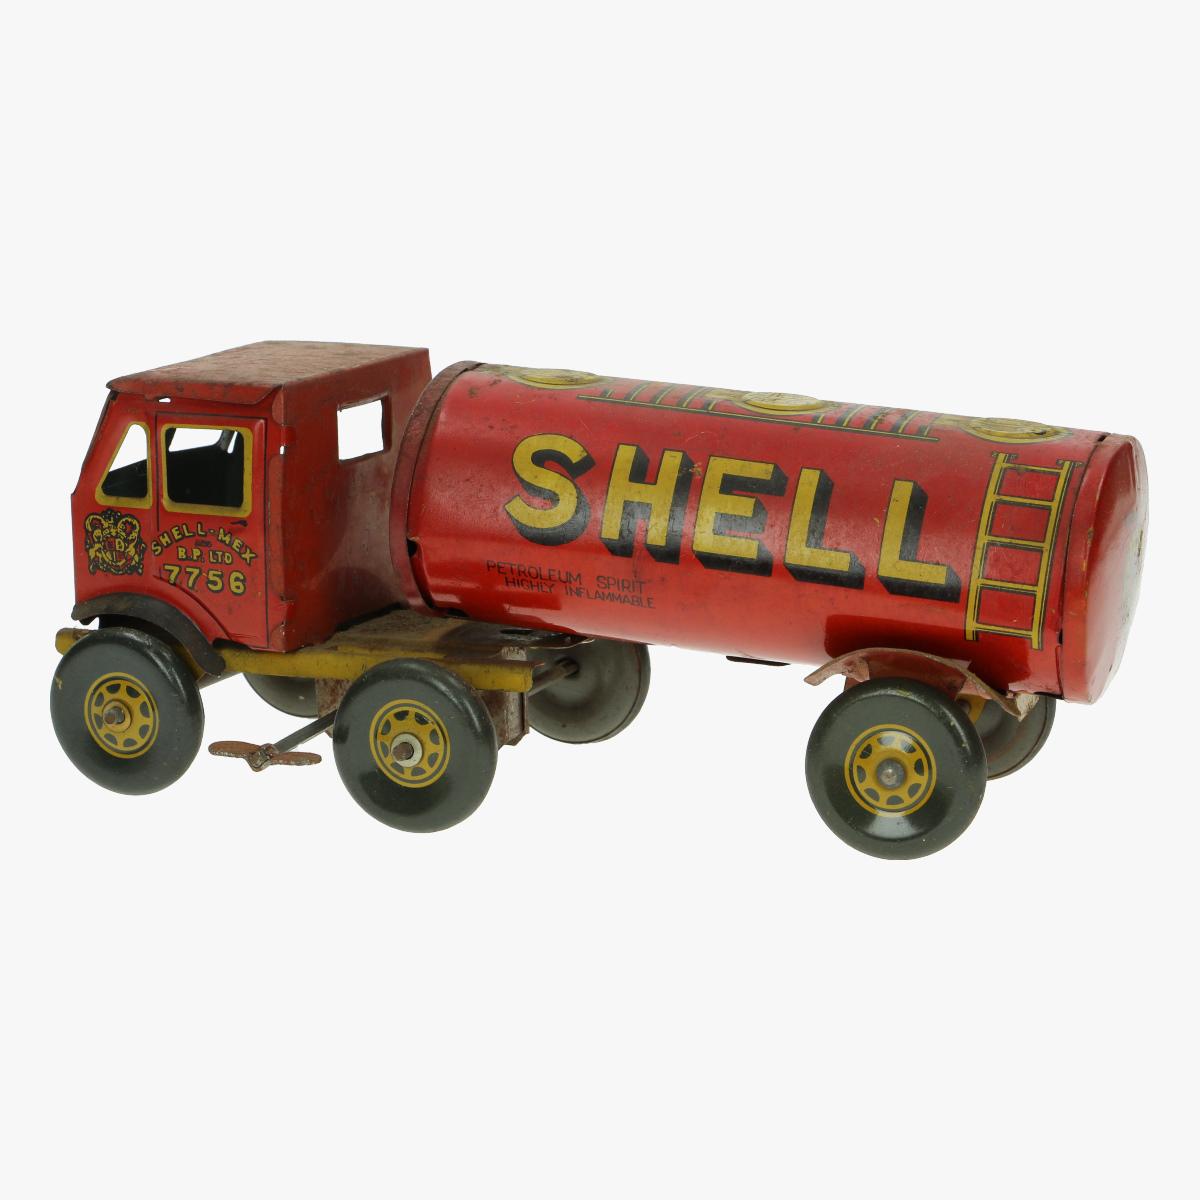 Afbeeldingen van oude blikken tankwagen shell made in GB